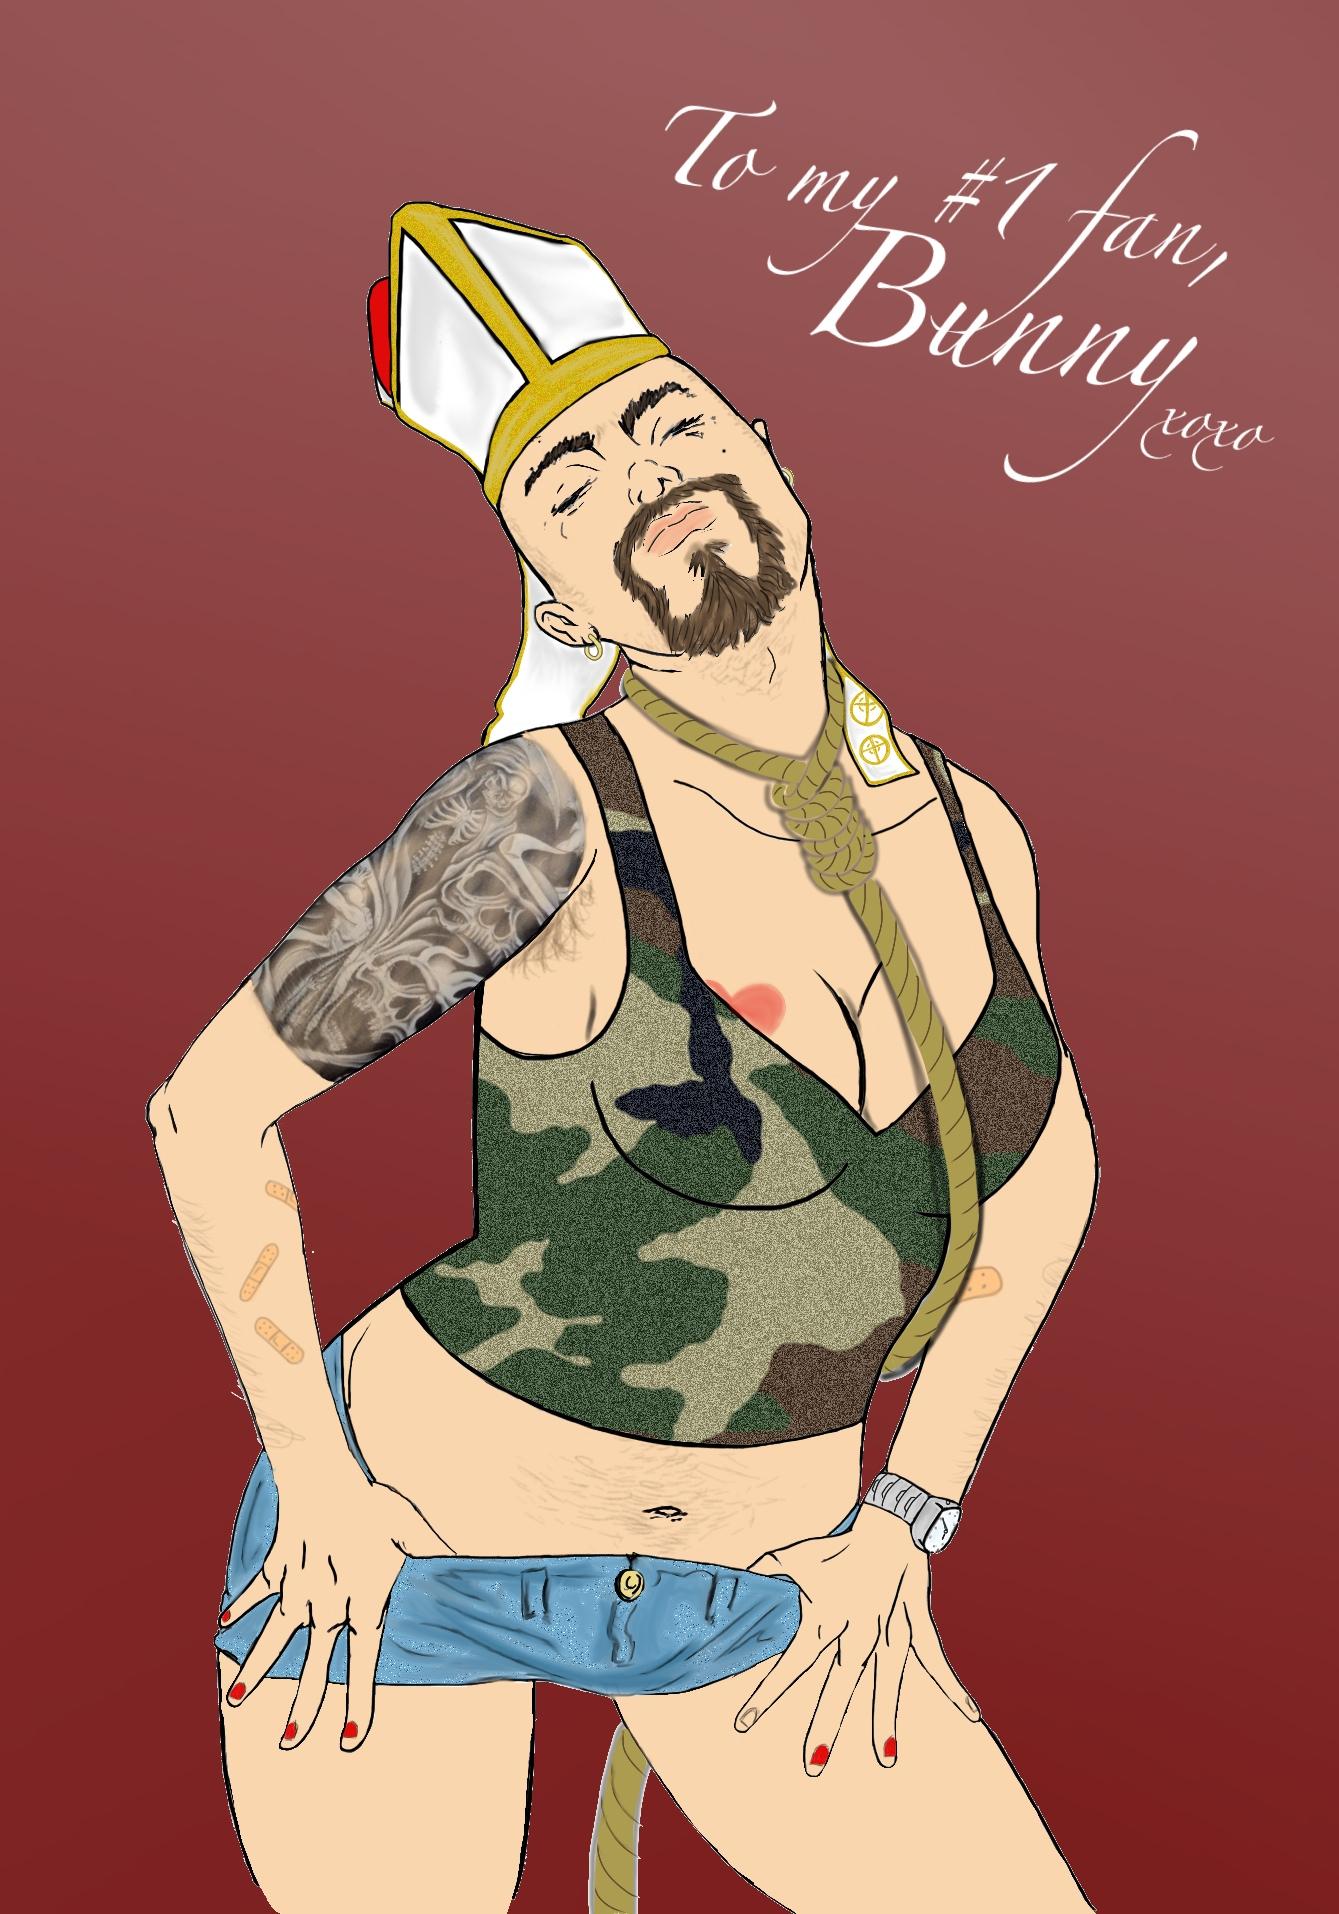 Bunny the Bearded Berserker